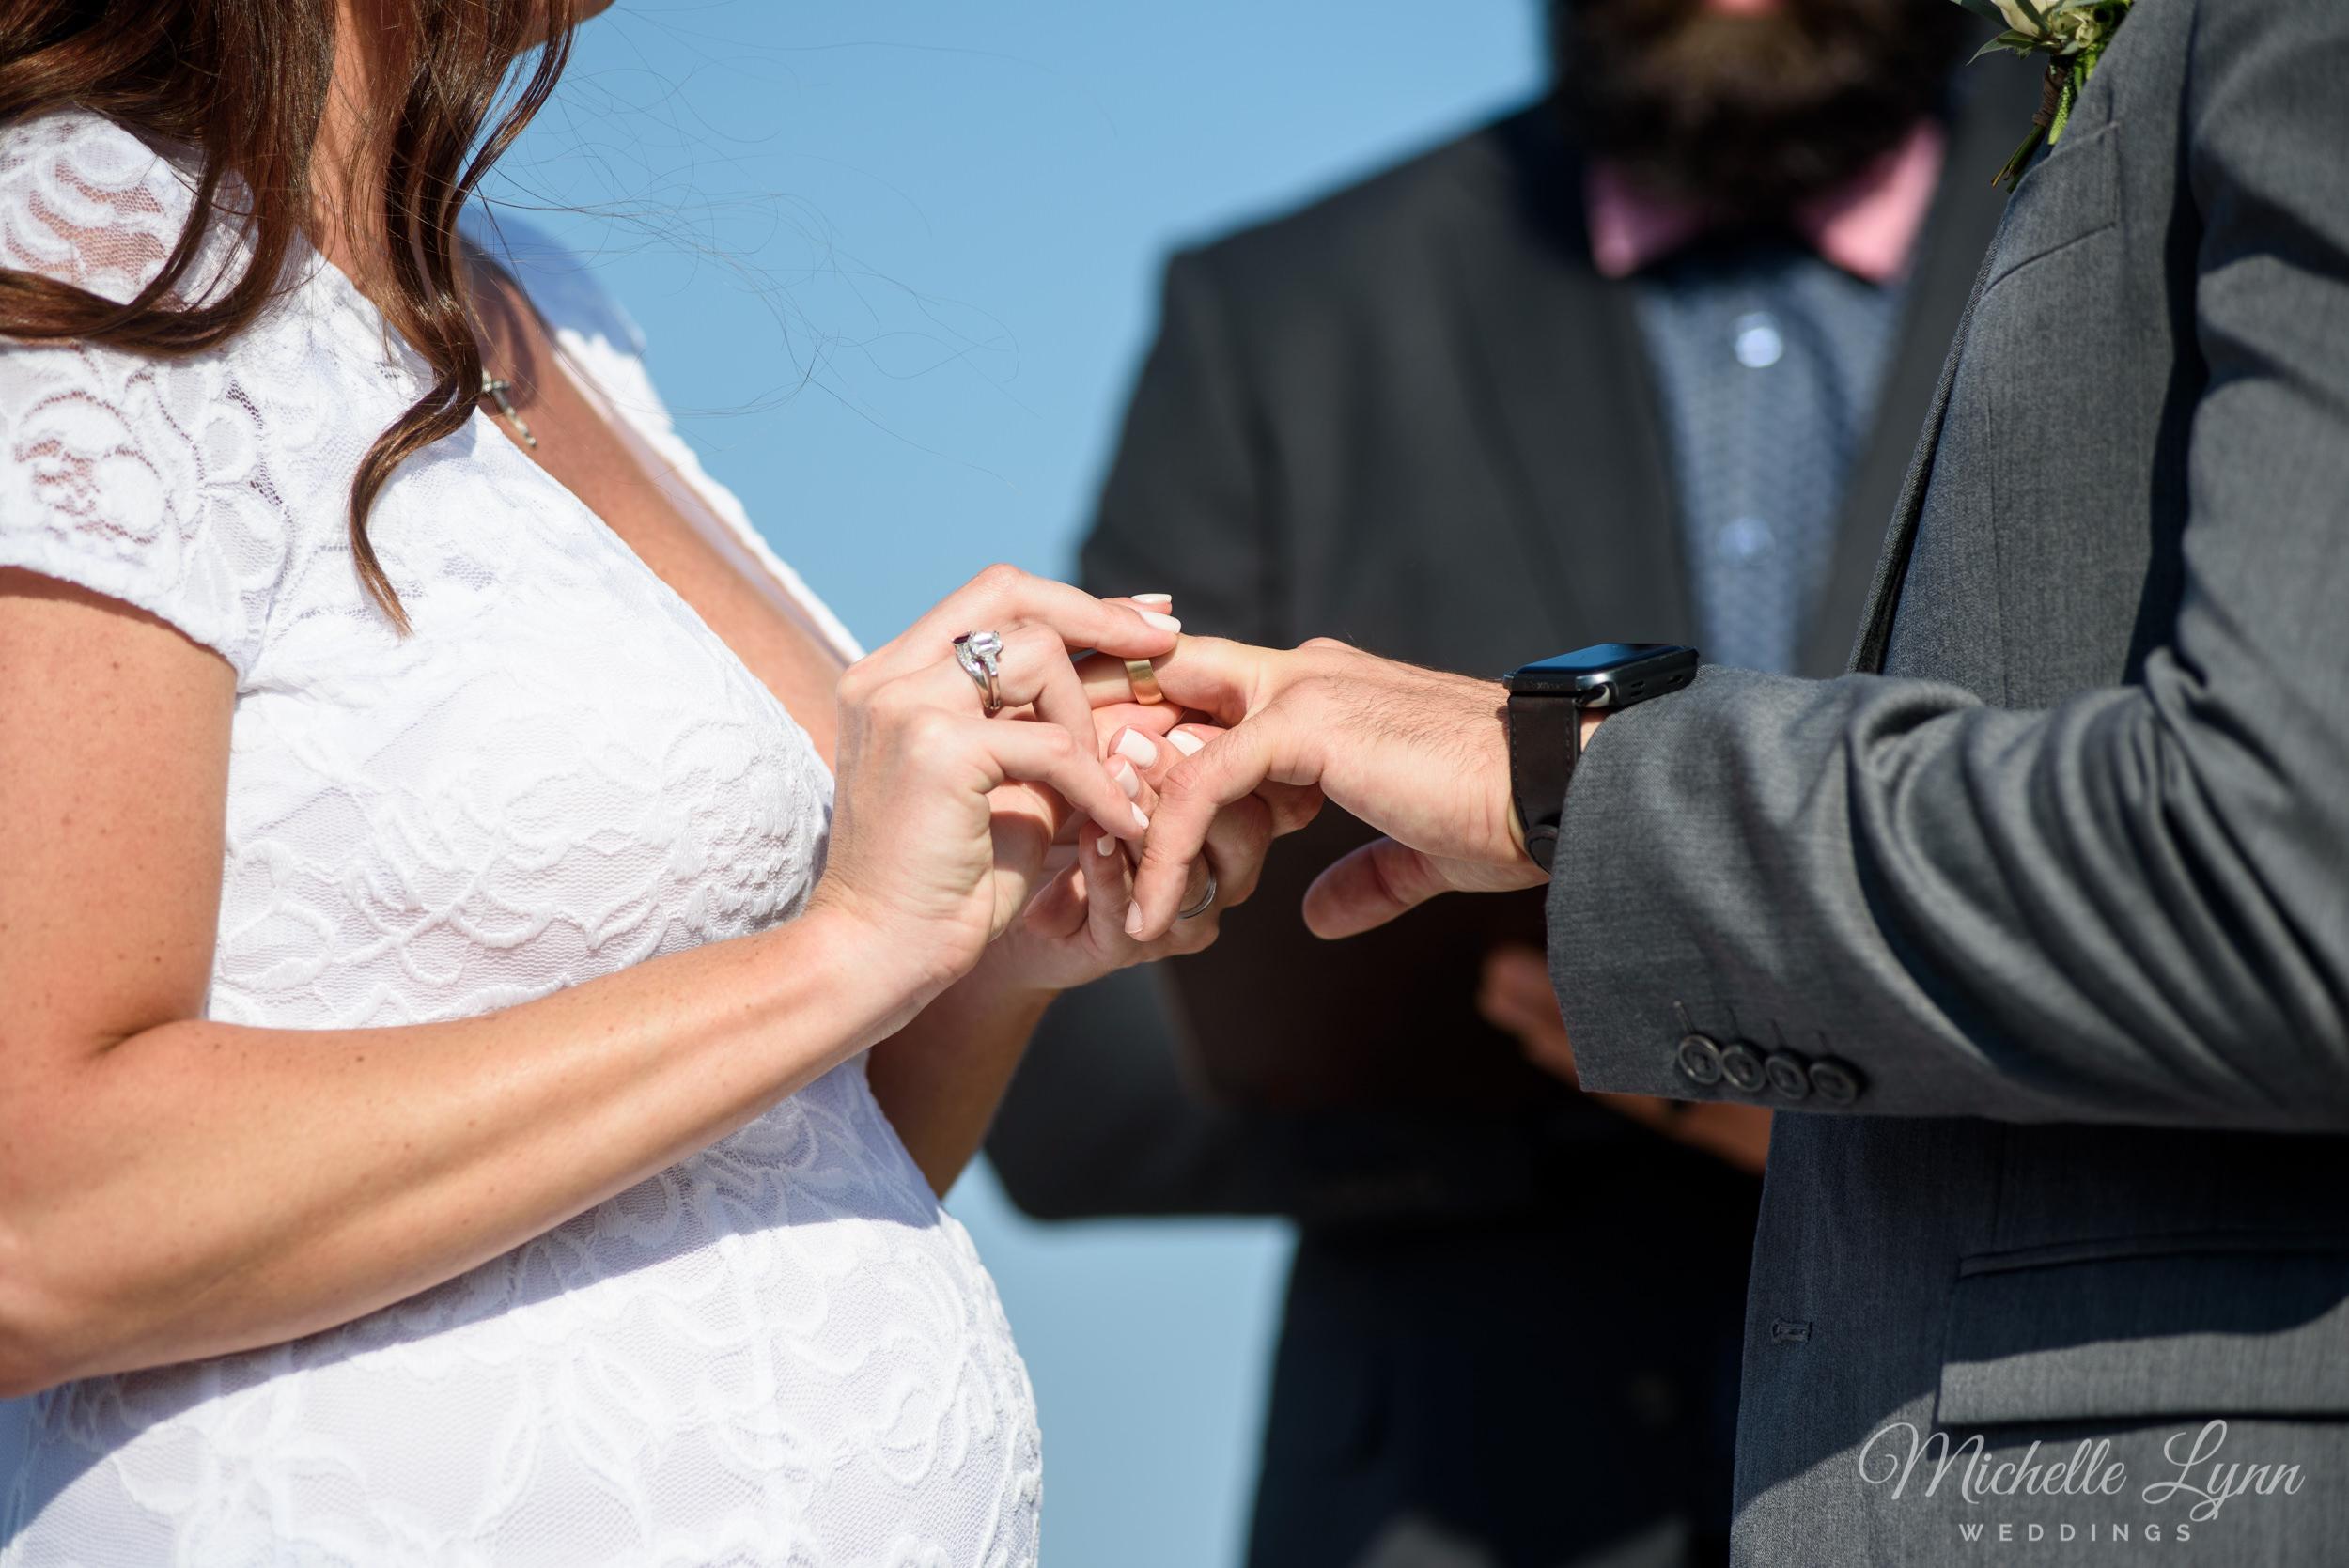 mlw-brant-beach-lbi-wedding-photography-32.jpg